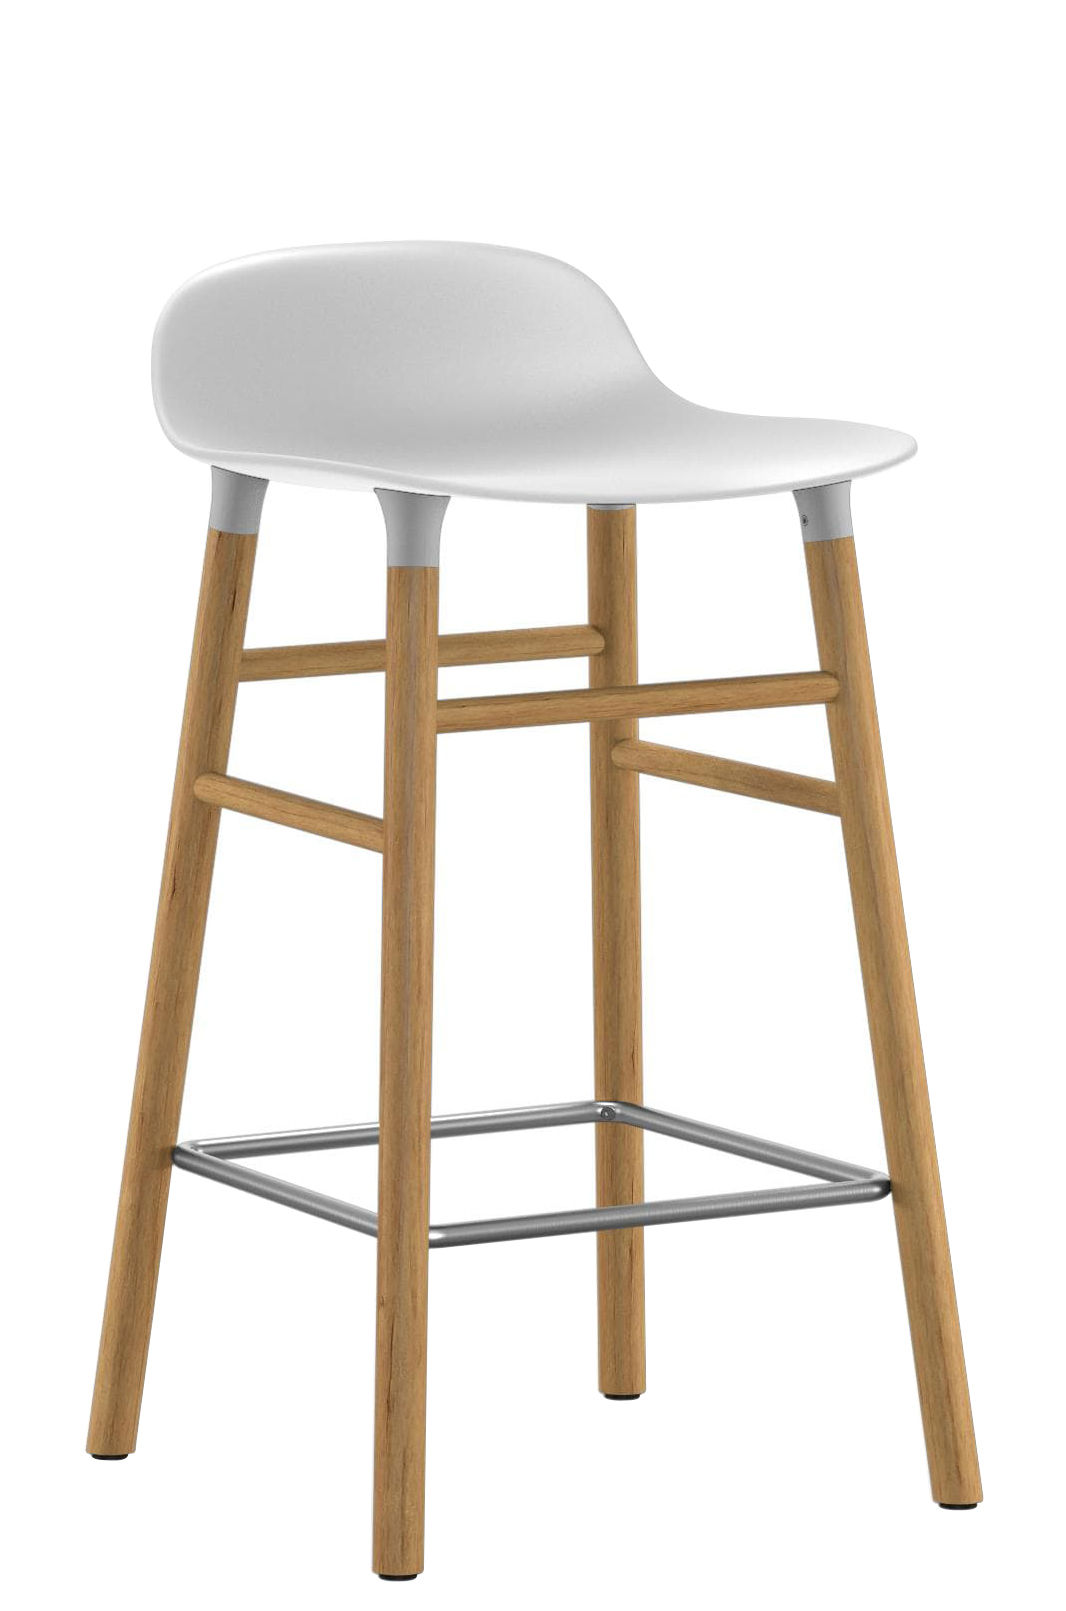 Furniture - Bar Stools - Form Bar stool - H 65 cm / Oak leg by Normann Copenhagen - White / oak - Oak, Polypropylene